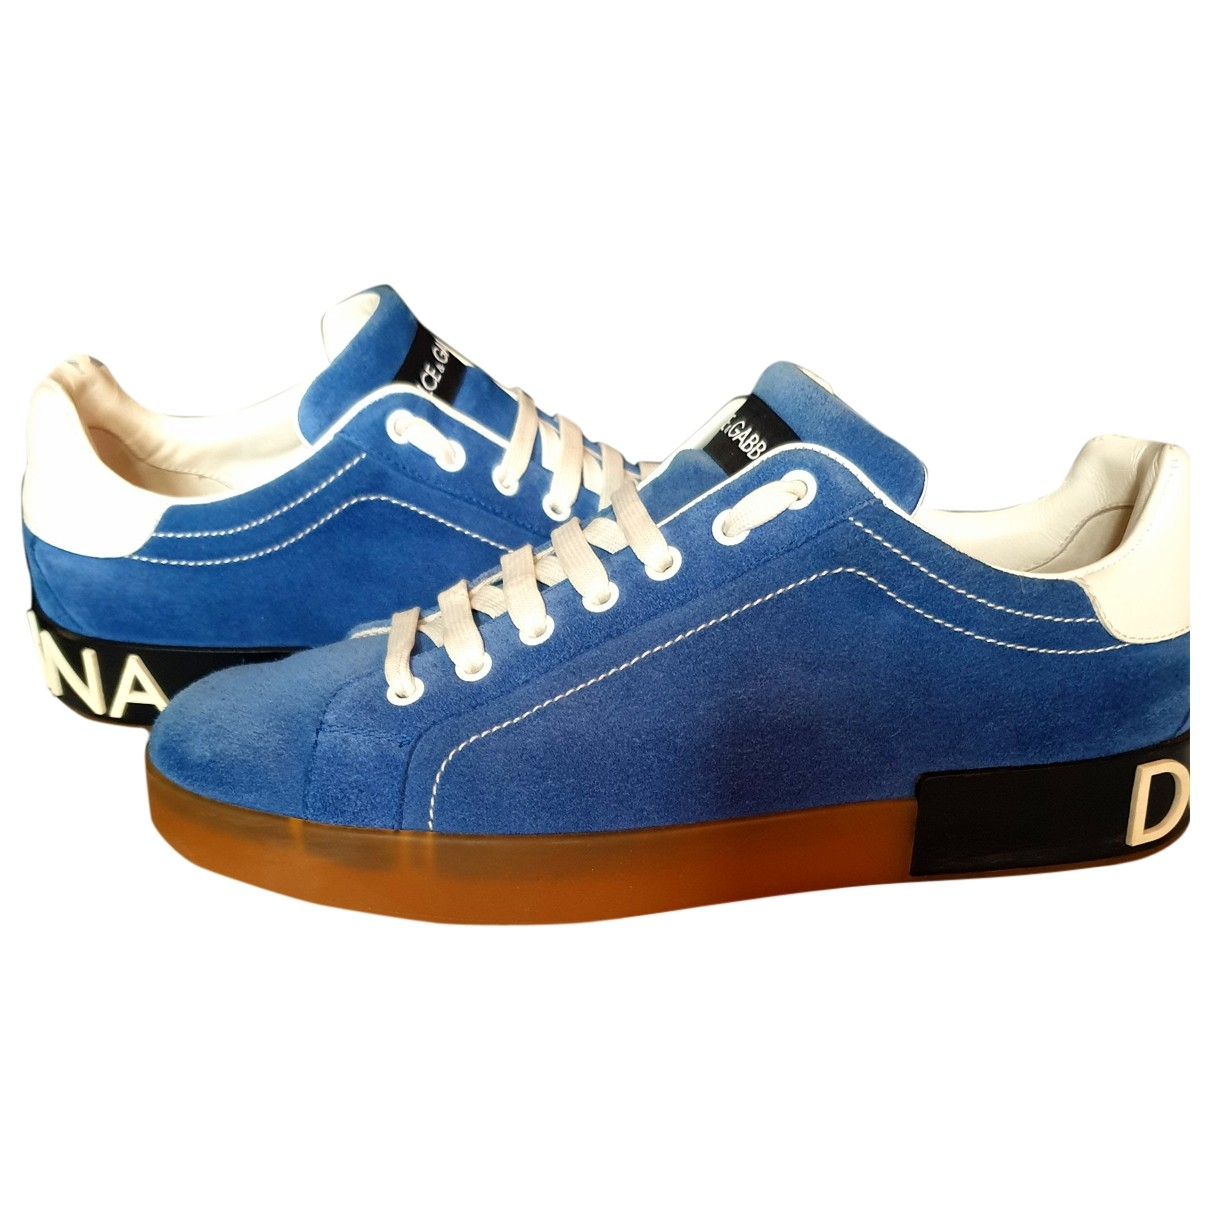 Dolce & Gabbana - Baskets Portofino pour homme en suede - bleu